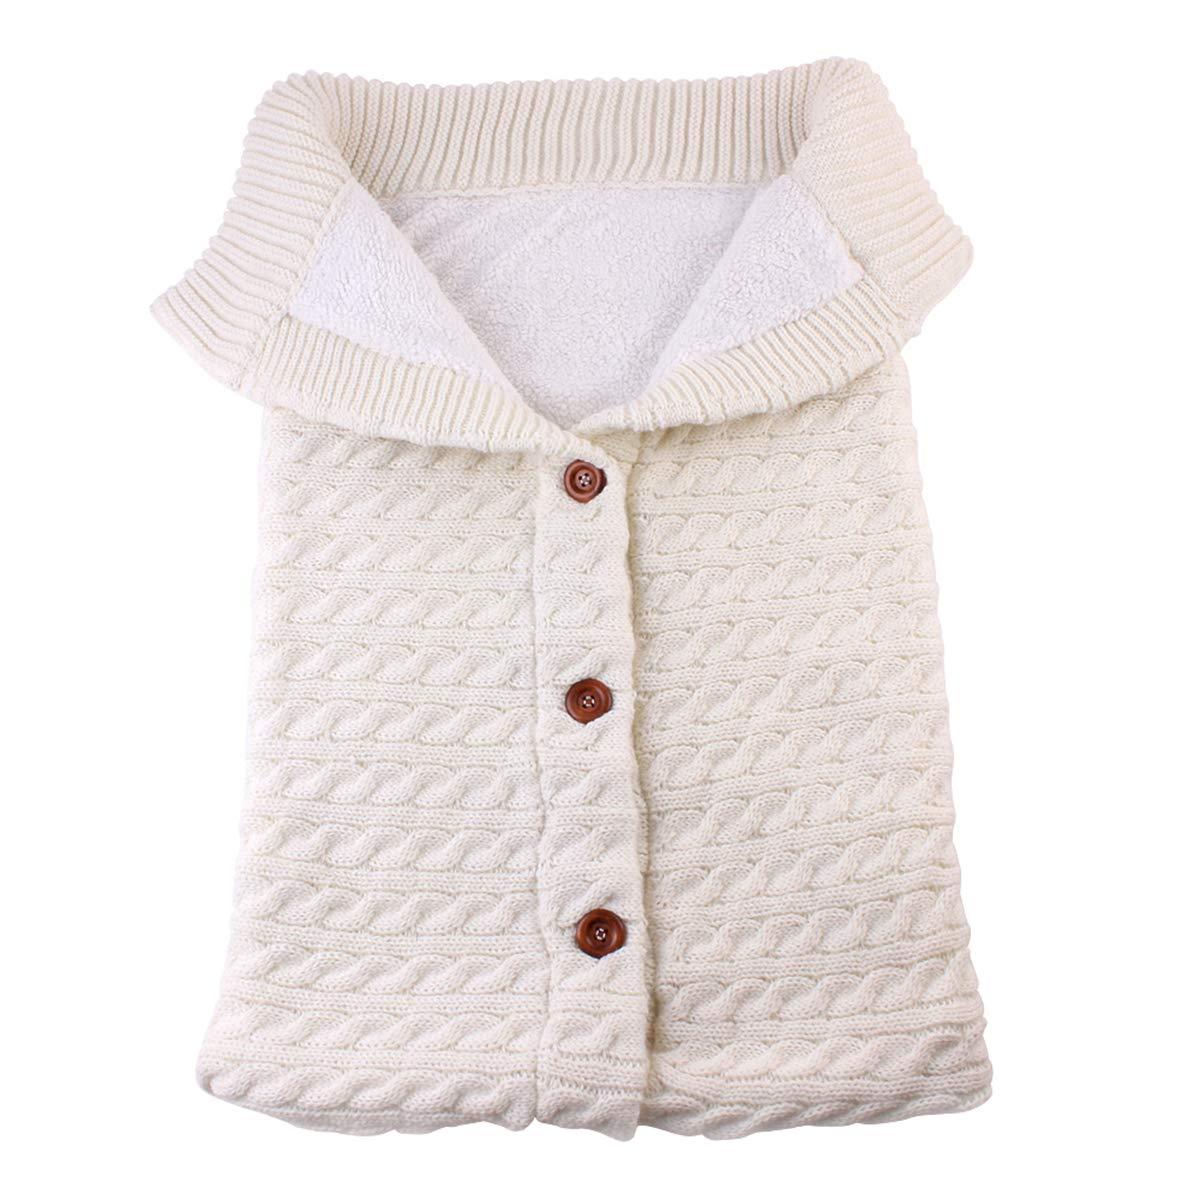 Newborn Baby Swaddle Blanket Stroller Wrap Plus Velvet, Yinuoday Baby Kids Toddler Thick Knit Soft Warm Fleece Blanket Swaddle Sleeping Bag Sleep Sack Stroller for Boys and Girls (Beige)